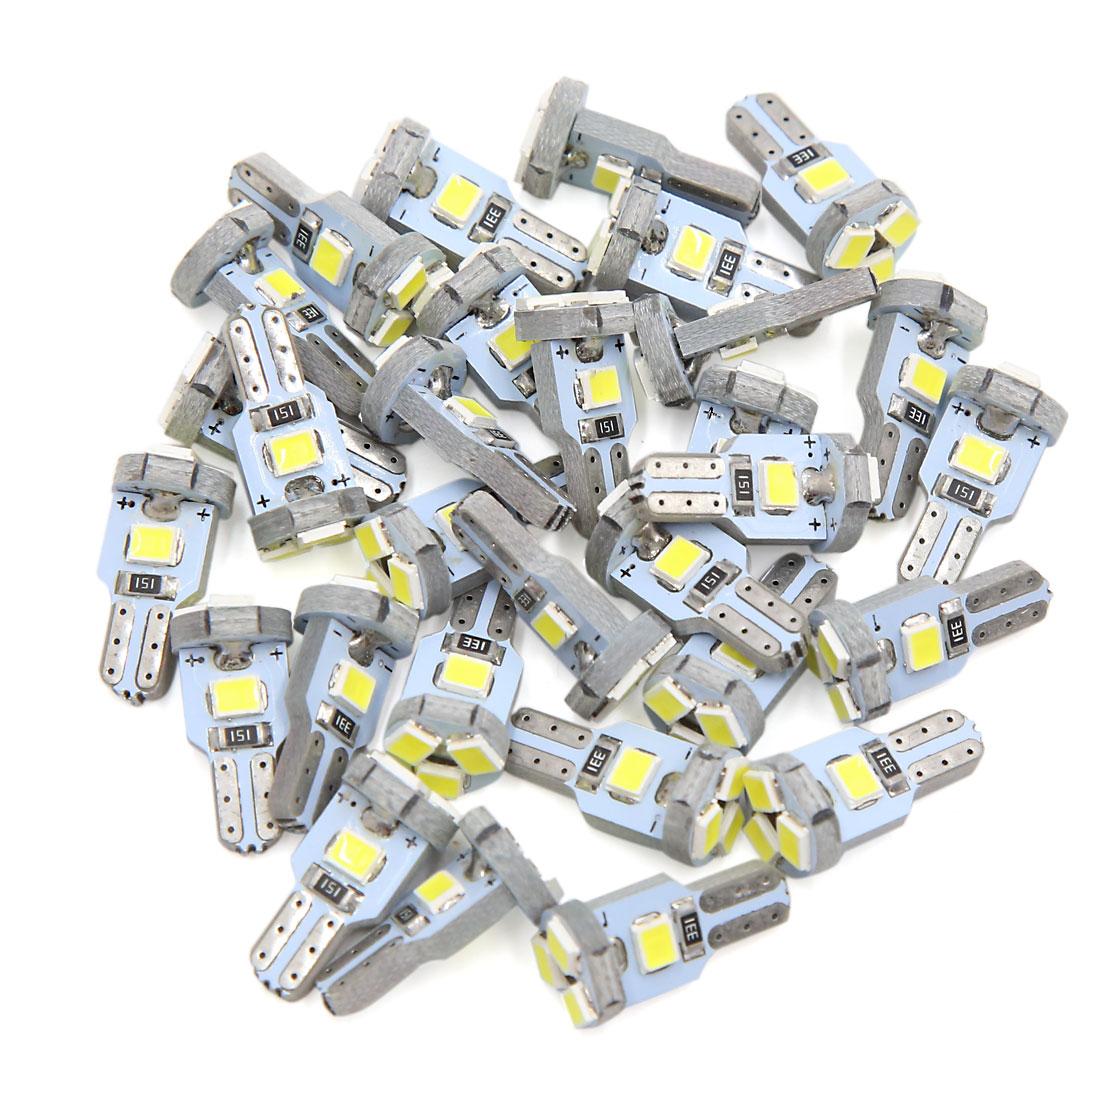 30 Pcs T5 5 White LED 1210 SMD Car Interior Dashboard Gauge Light Lamp Bulb